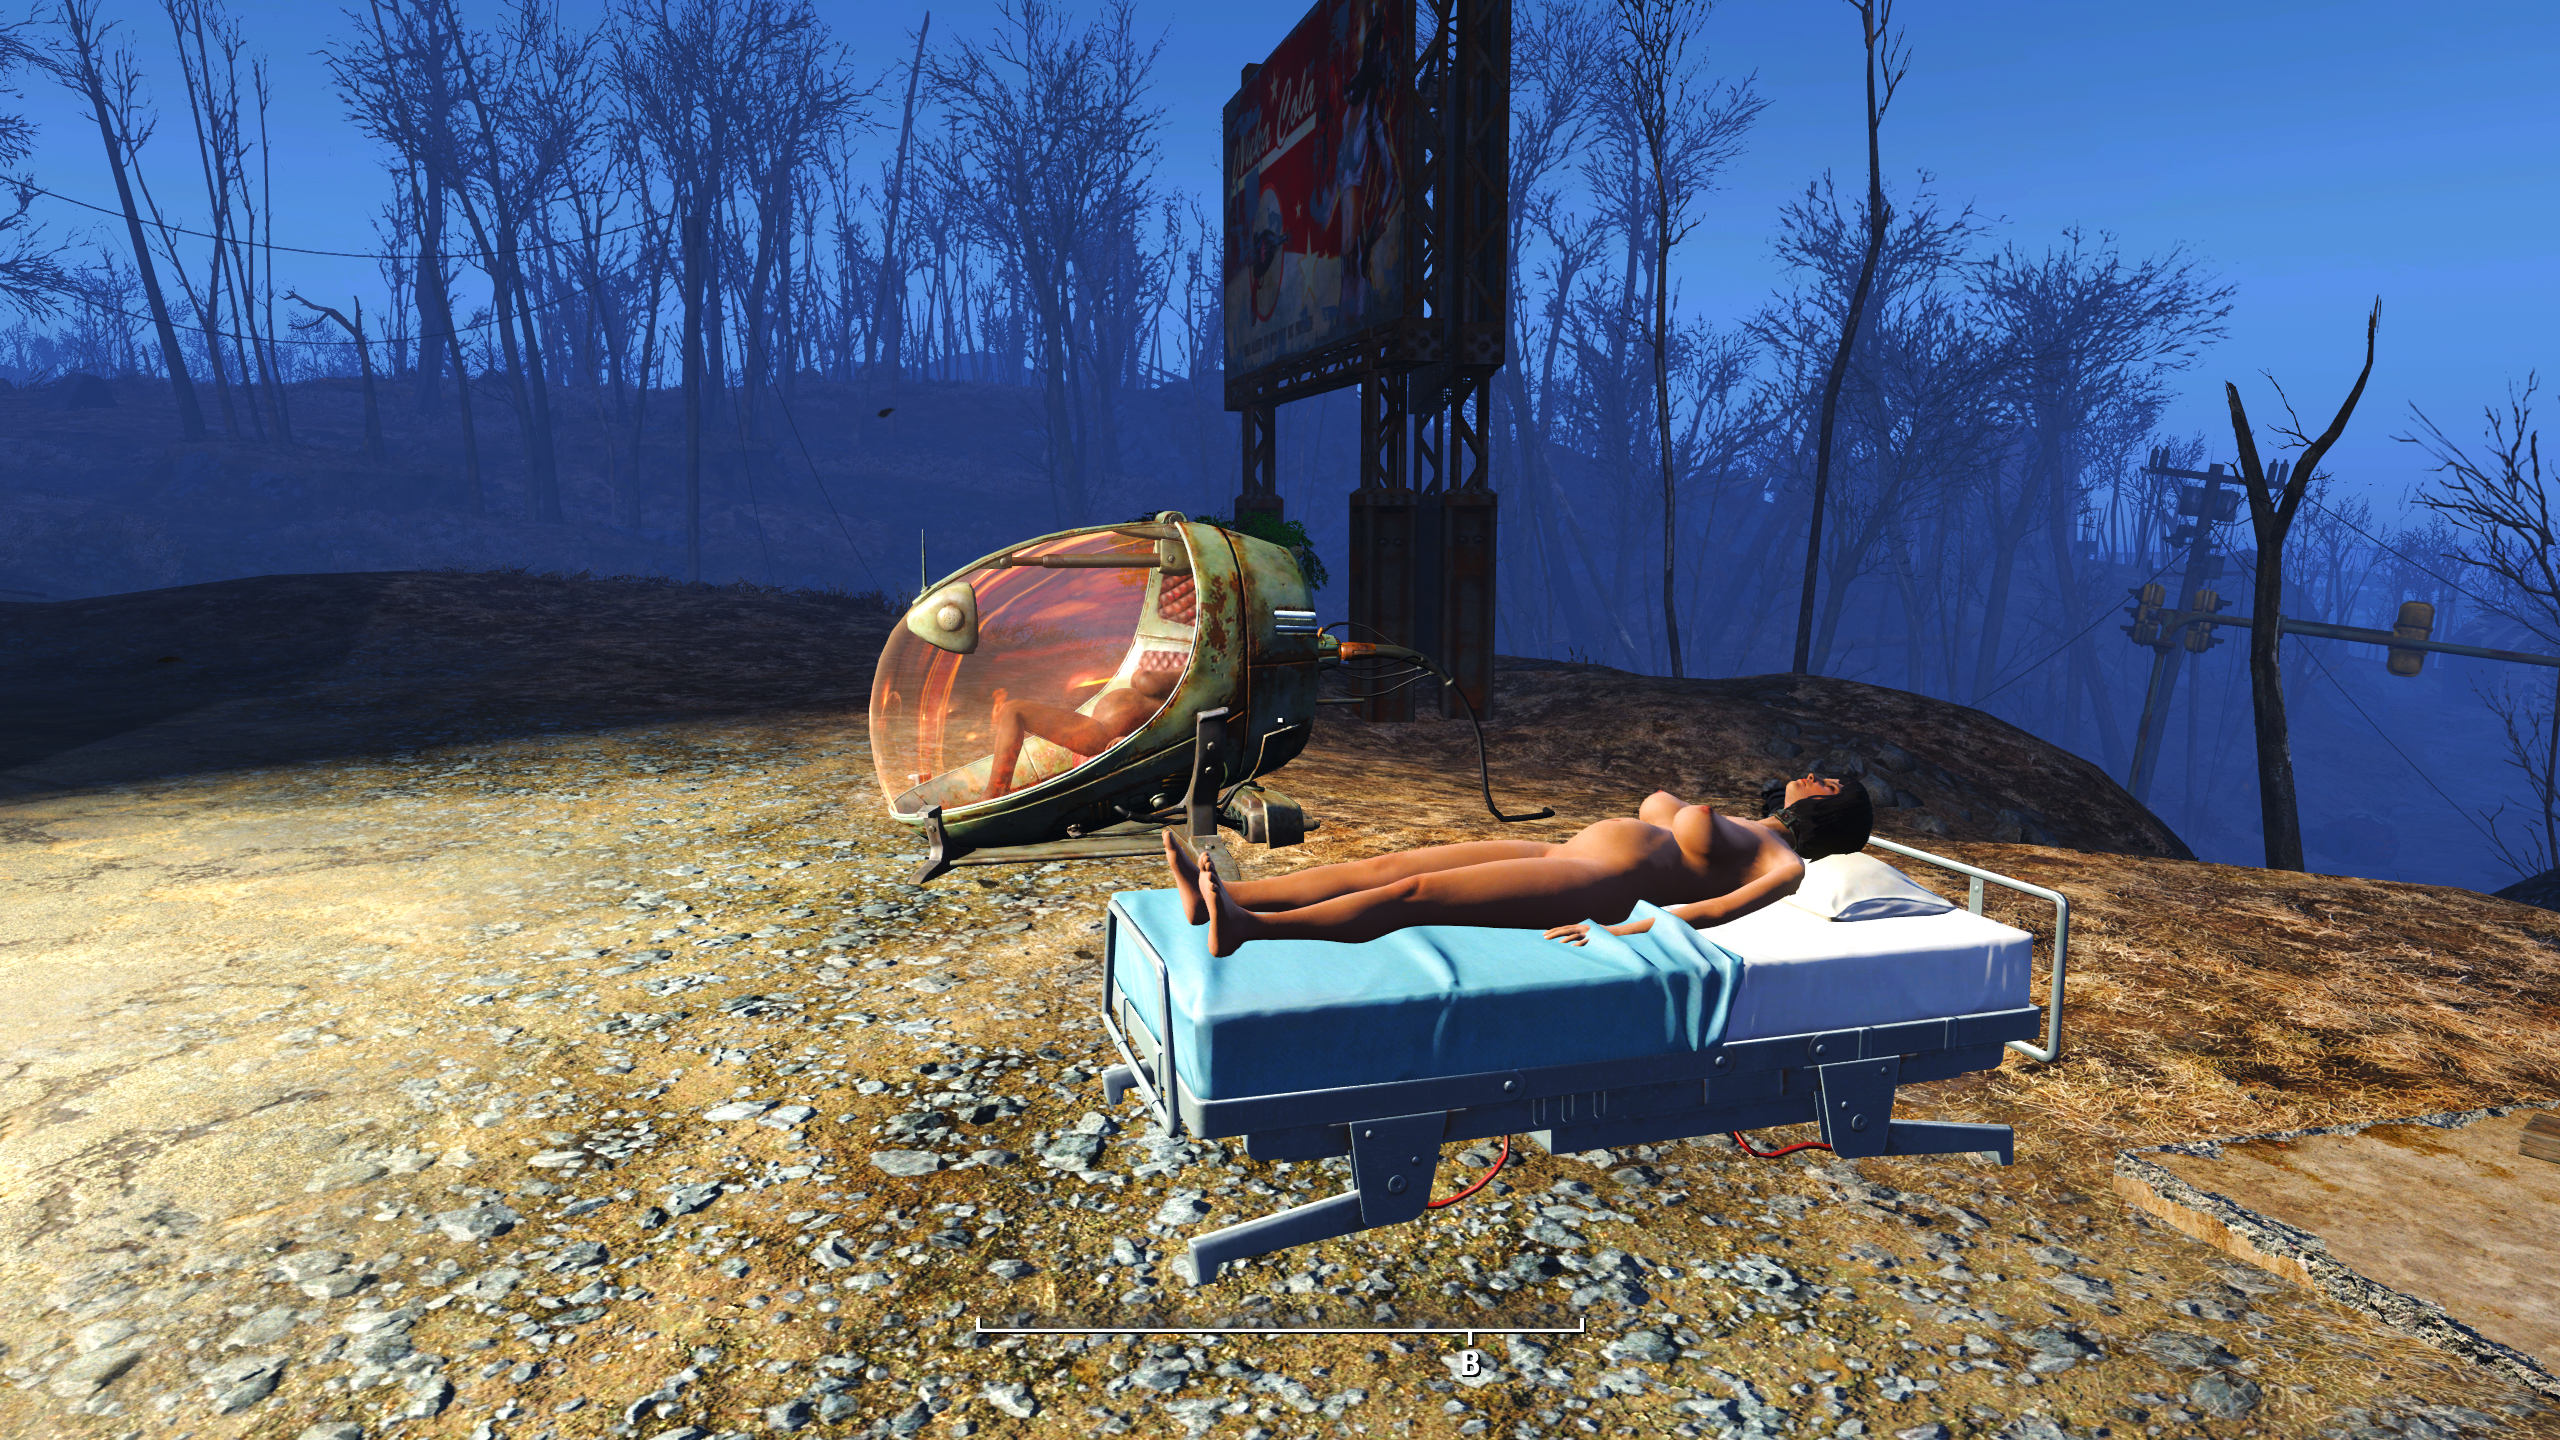 Fallout4_2021-01-17_19-59-22.jpg